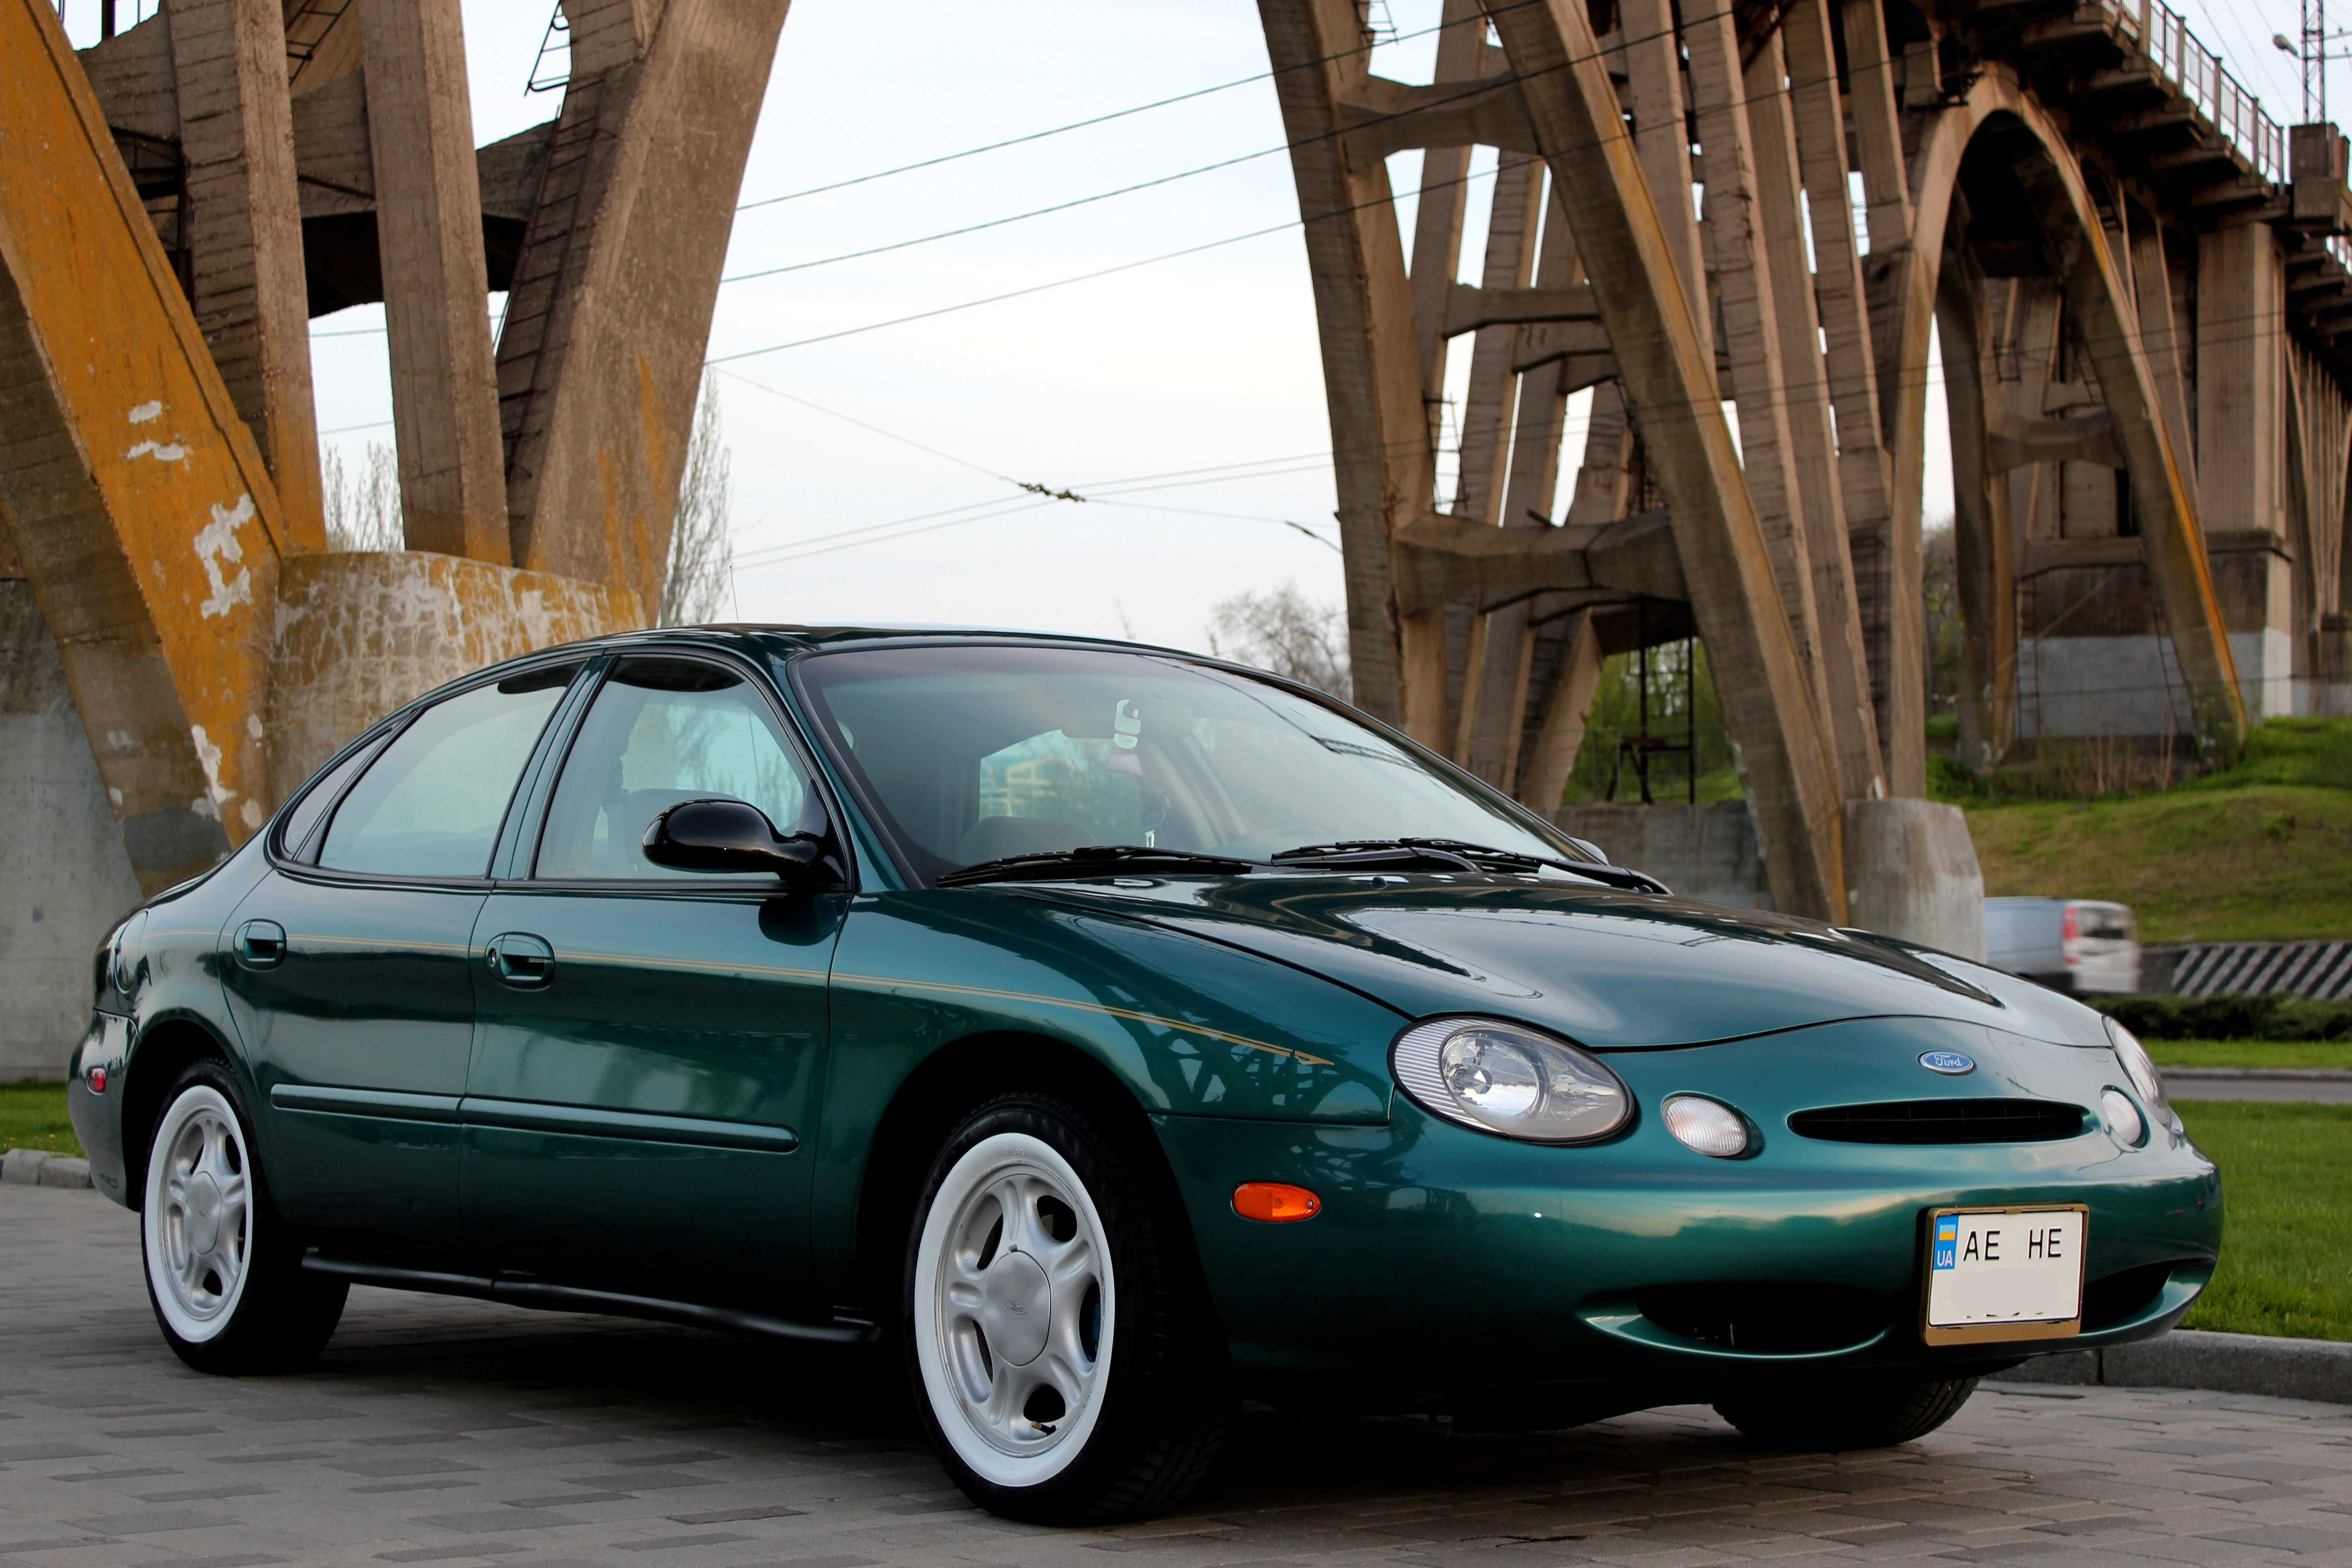 Ford Taurus - Идеальный